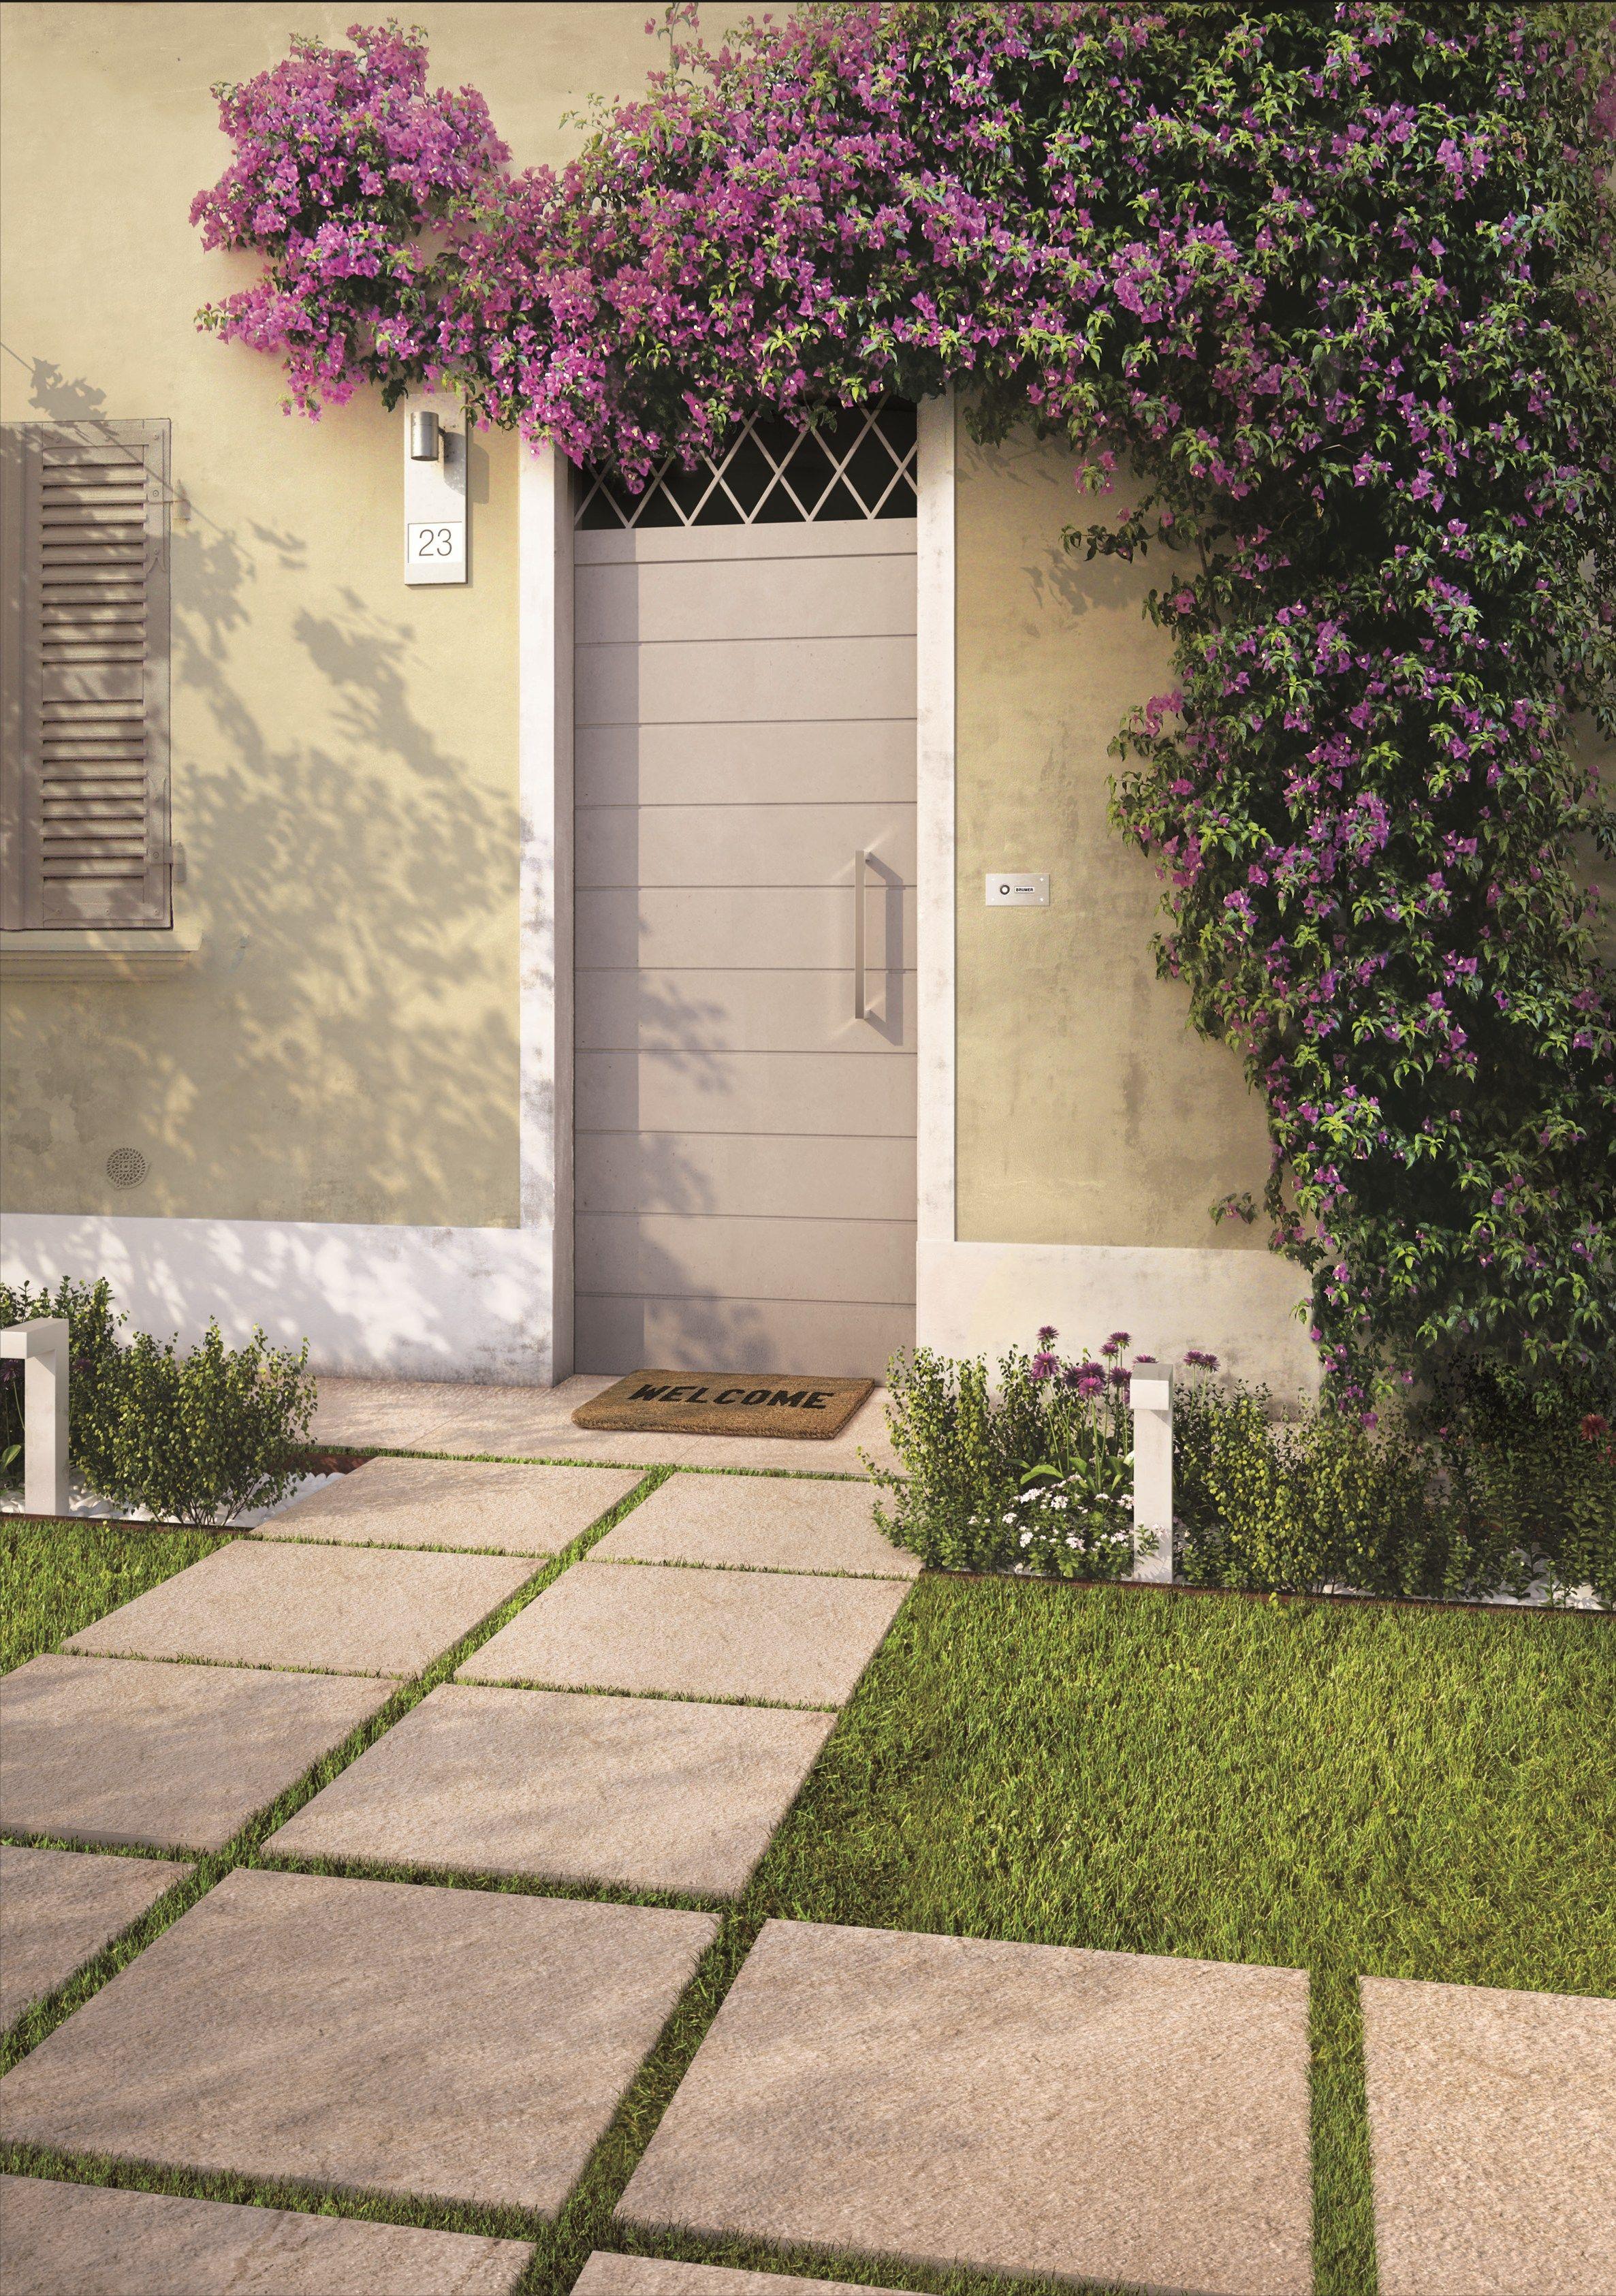 Glazed Stoneware Outdoor Floor Tiles Multiquartz 20 By Marazzi